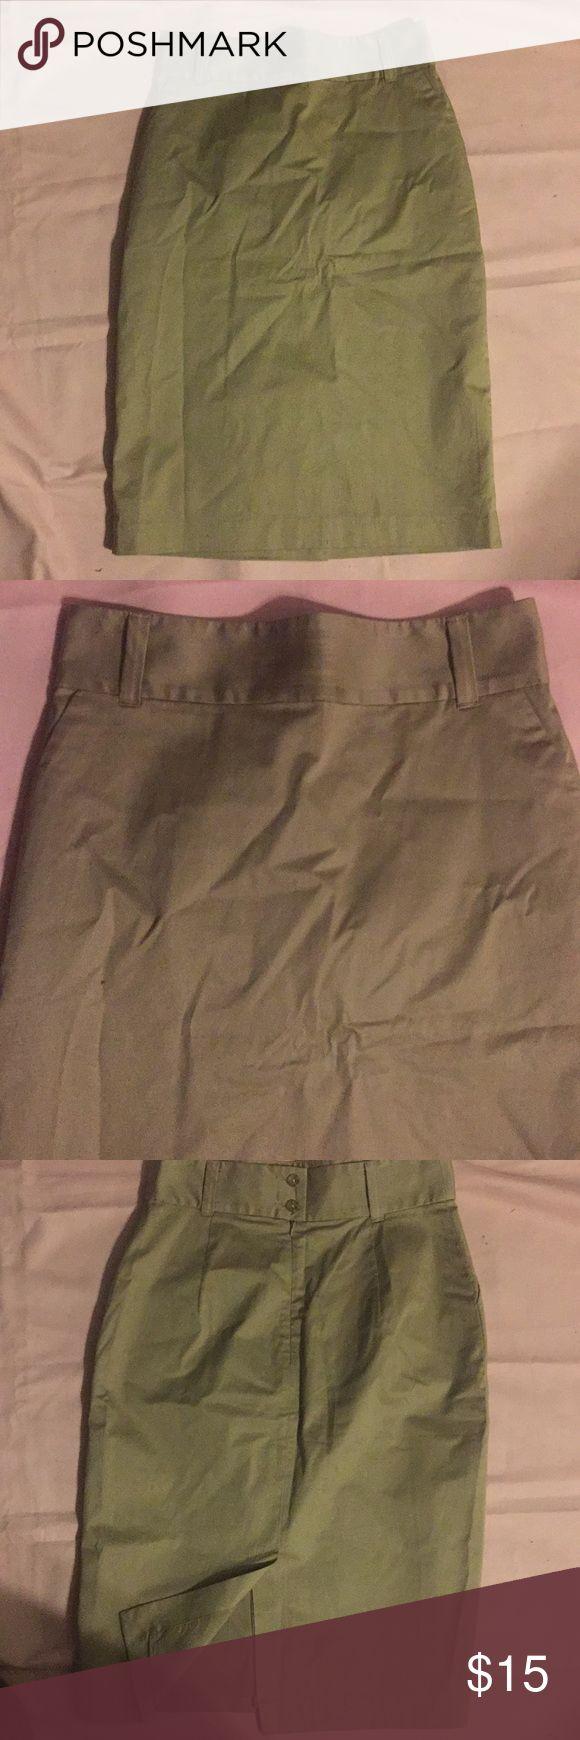 Banana Republic khaki pencil skirt Sz 8. Nice! Banana Republic khaki pencil skirt Sz 8. Nice!  Back zip. Wide waistband   Lined. 95% cotton. 5% spandex. Lining is 95% polyester. 5% spandex   Skirt is like New! Banana Republic Skirts Pencil